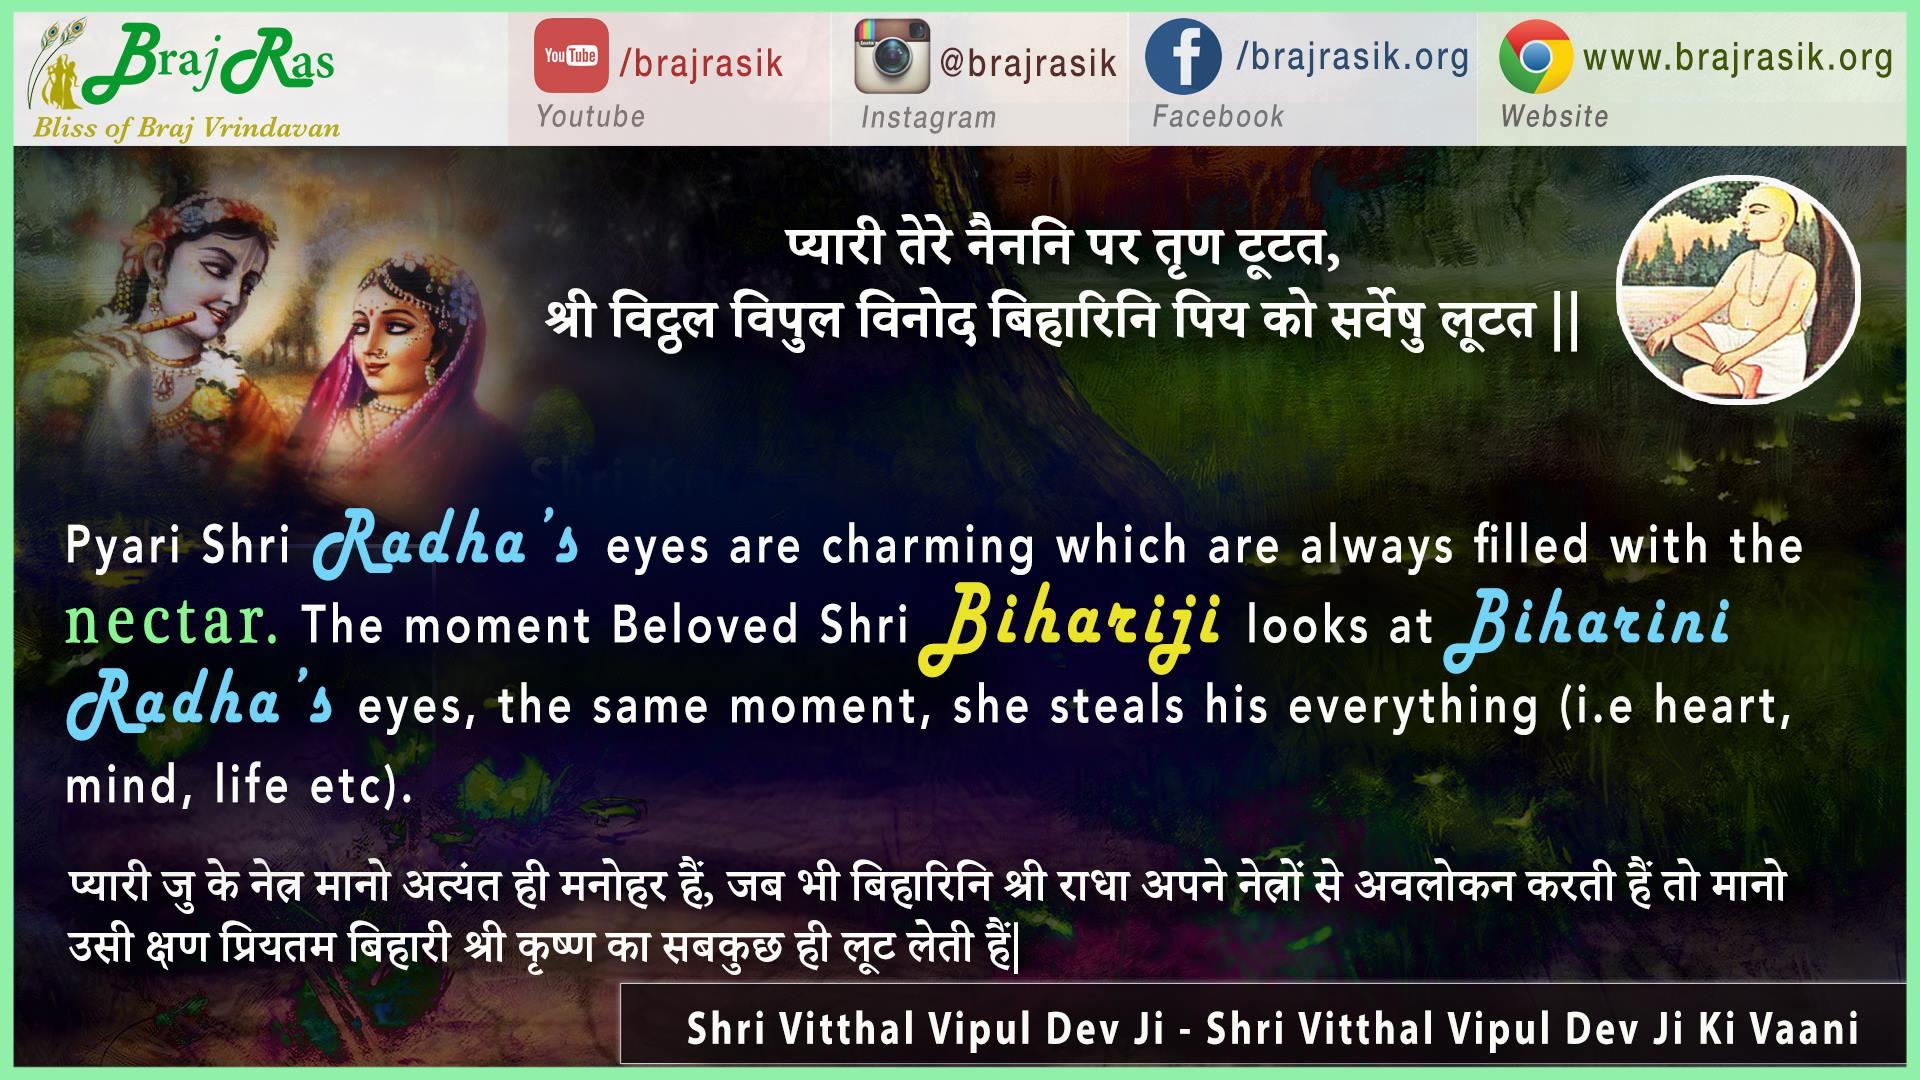 """Pyari Tere Nainani Par Trin Tutata Quote"" - Shri Vitthal Vipul Dev Ji - Shri Vitthal Vipul Dev Ji Ki Vaani"